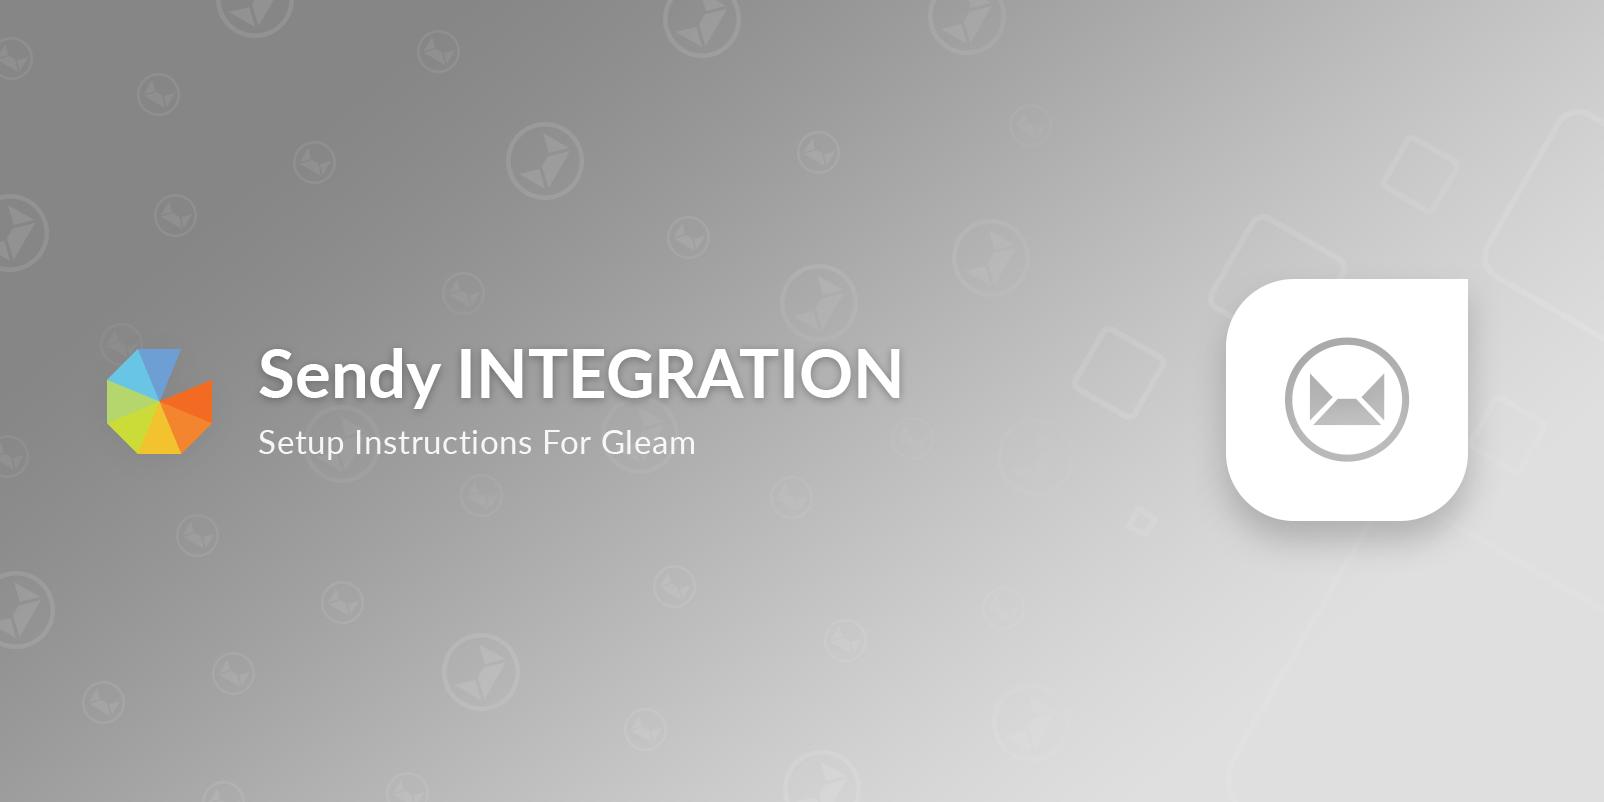 Gleam Sendy Integration